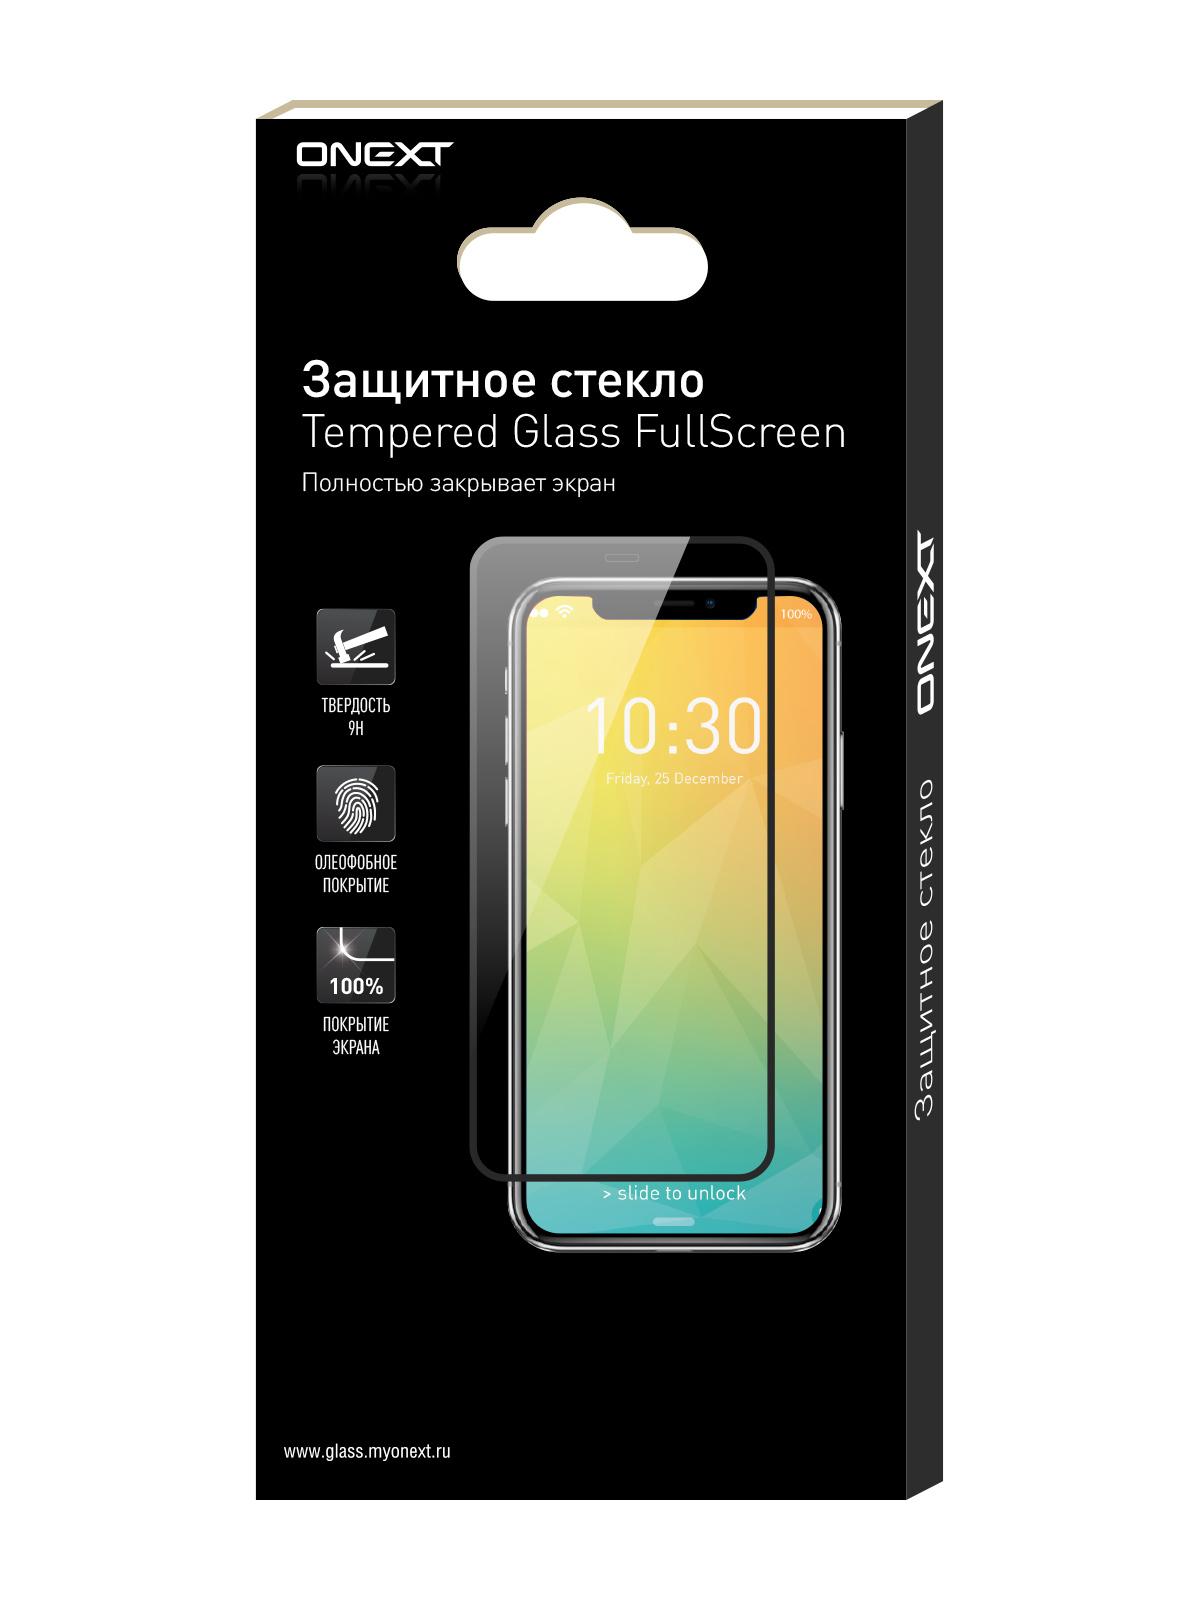 Защитное стекло ONEXT для Asus ZenFone 3 Laser (ZC551KL) White